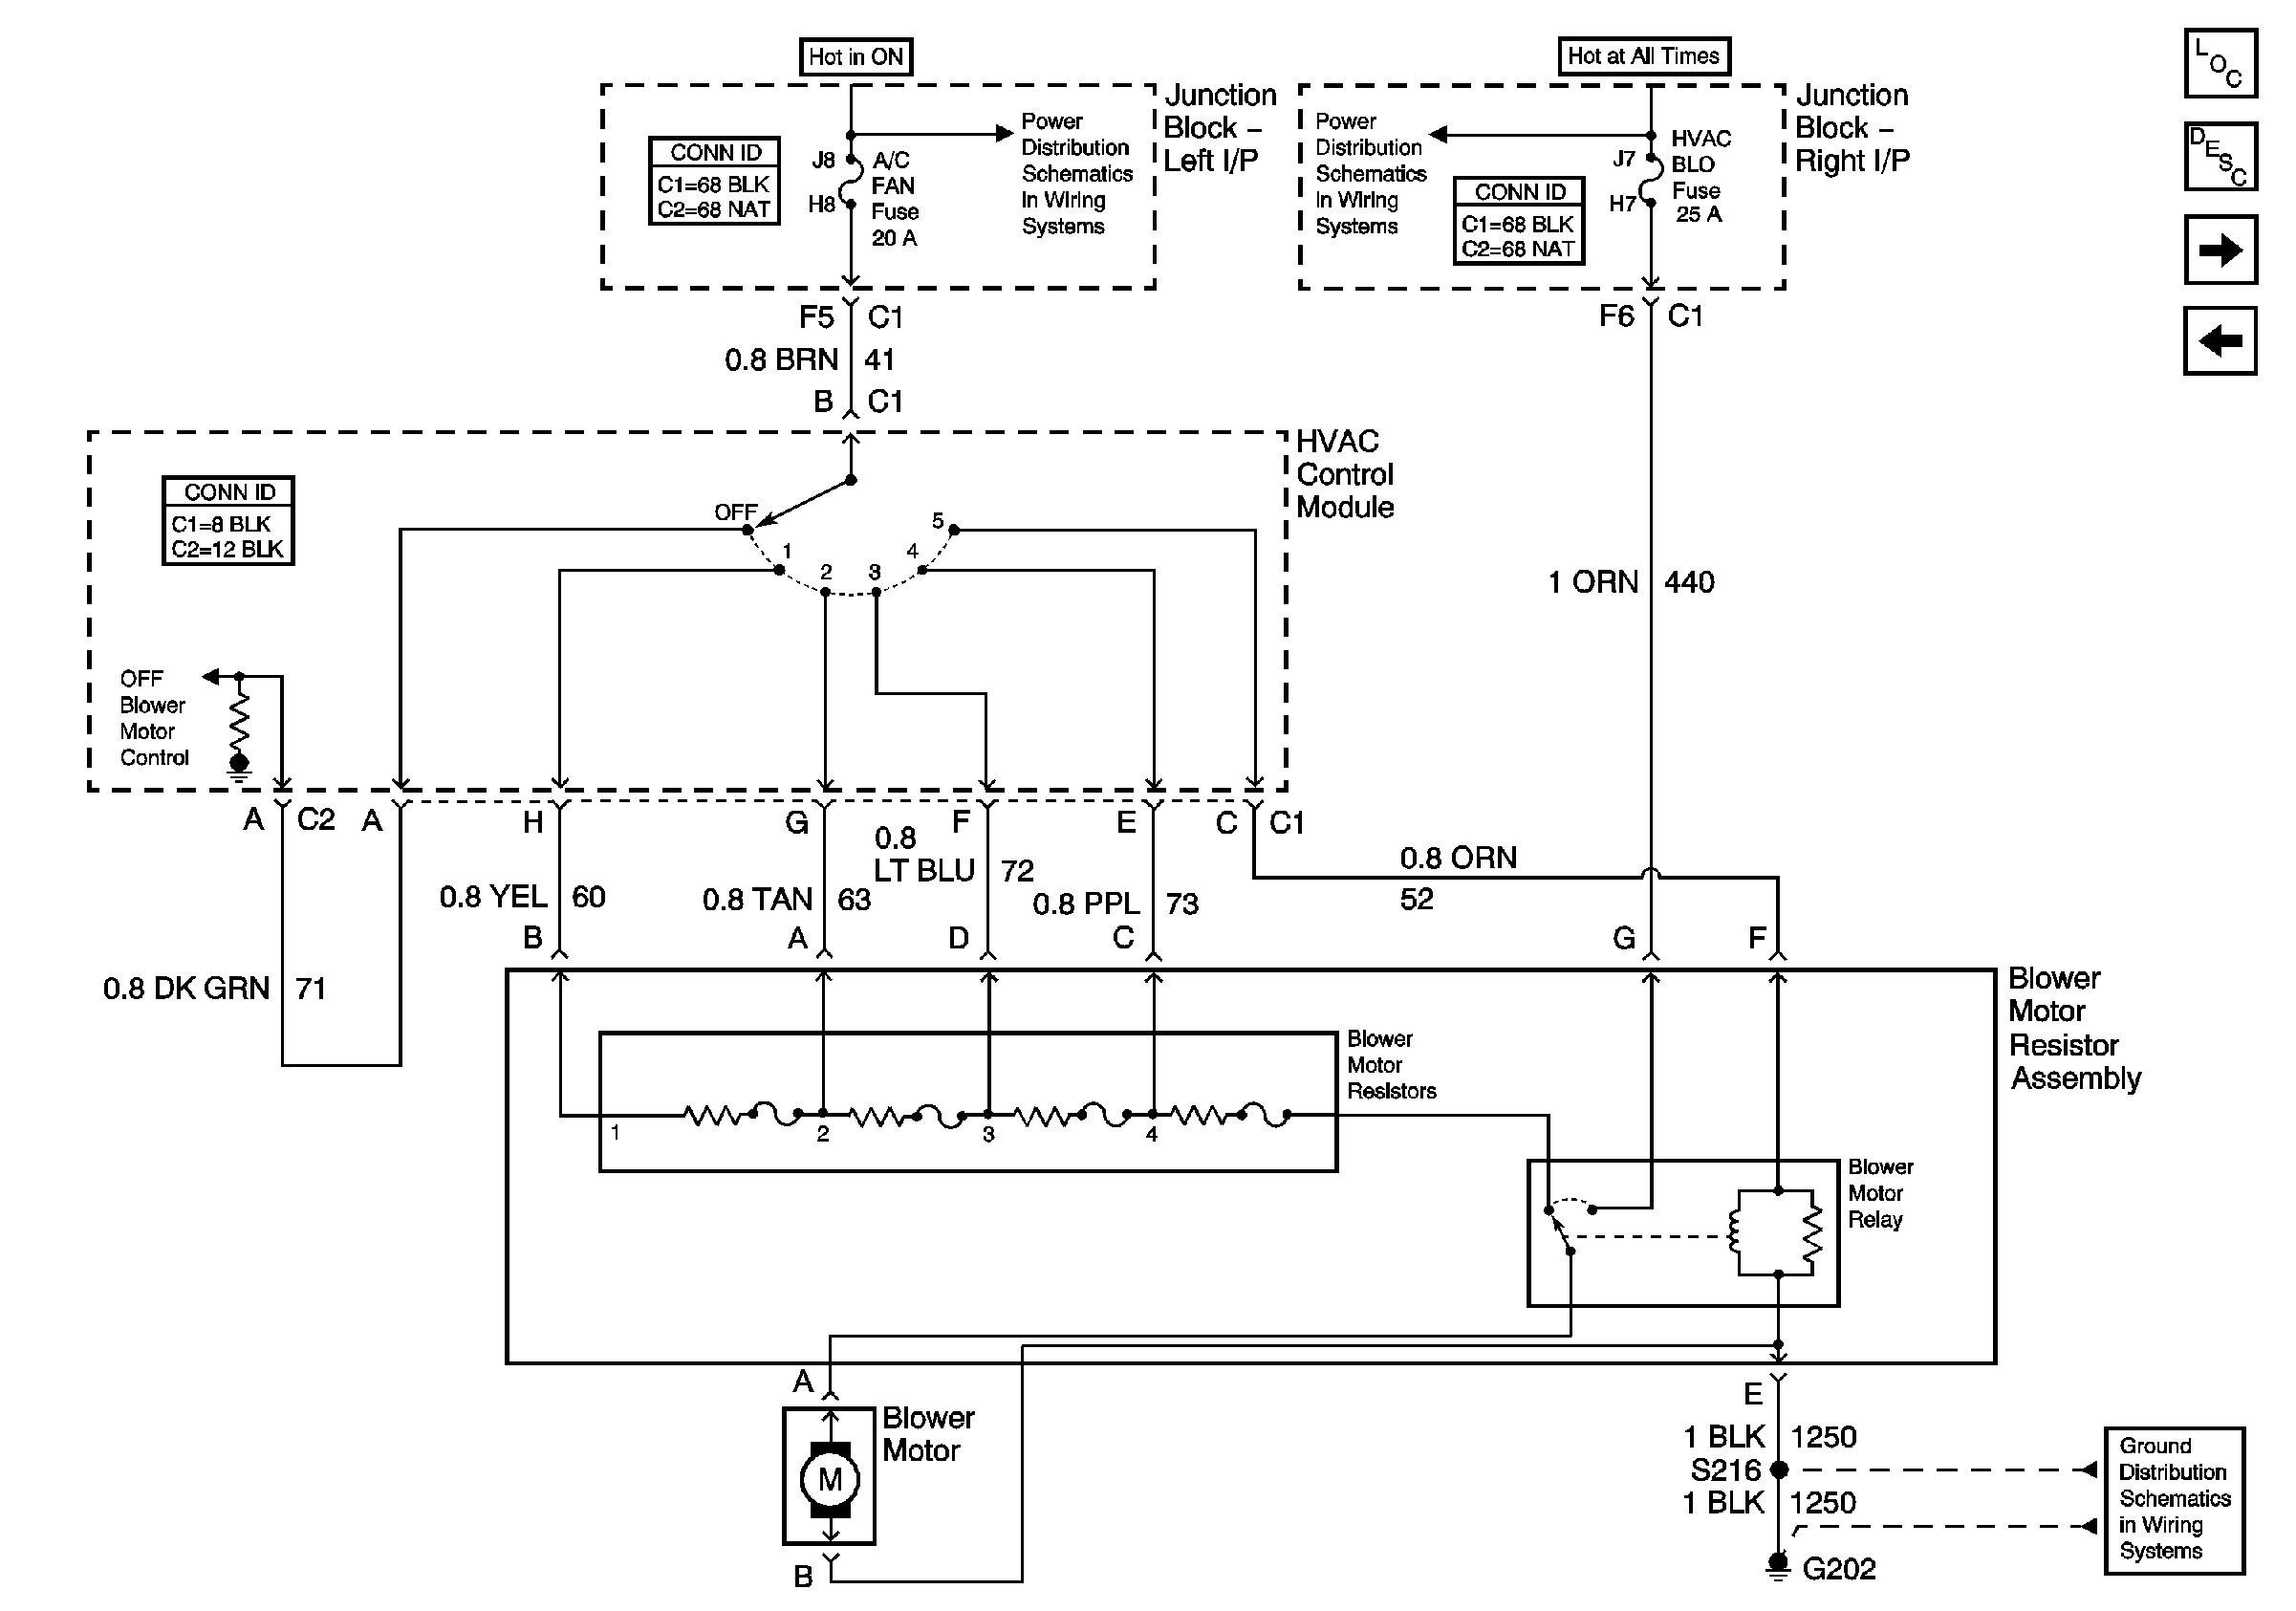 2004 Kia Sedona Engine Diagram 07 Suburban Blower Motor Wiring Diagram Wiring Data Of 2004 Kia Sedona Engine Diagram